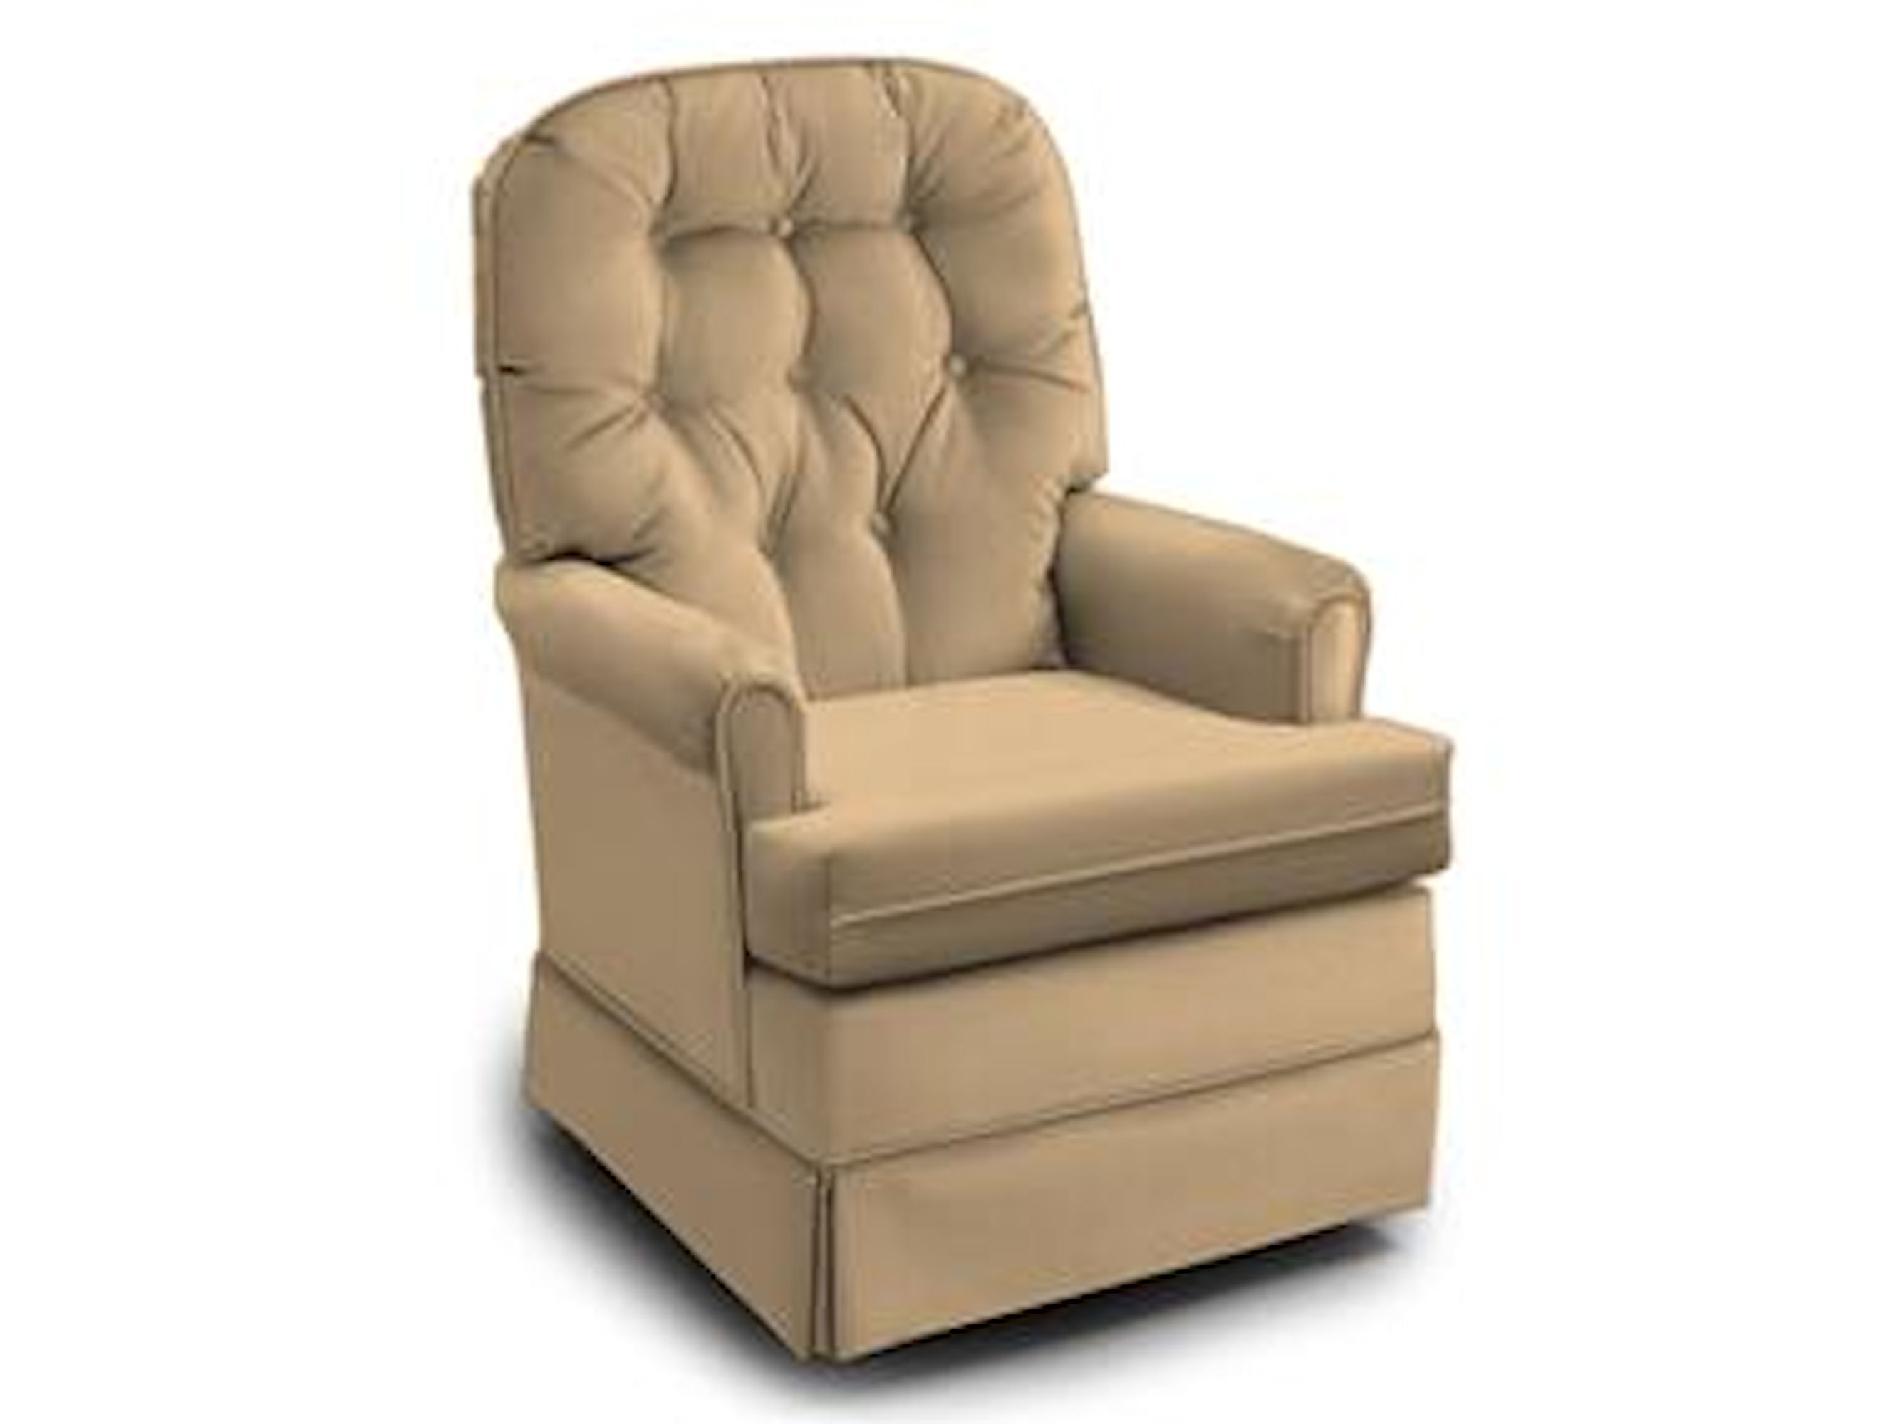 best chairs c o home furnish high chair cover pad furnishings grand swivel rocker